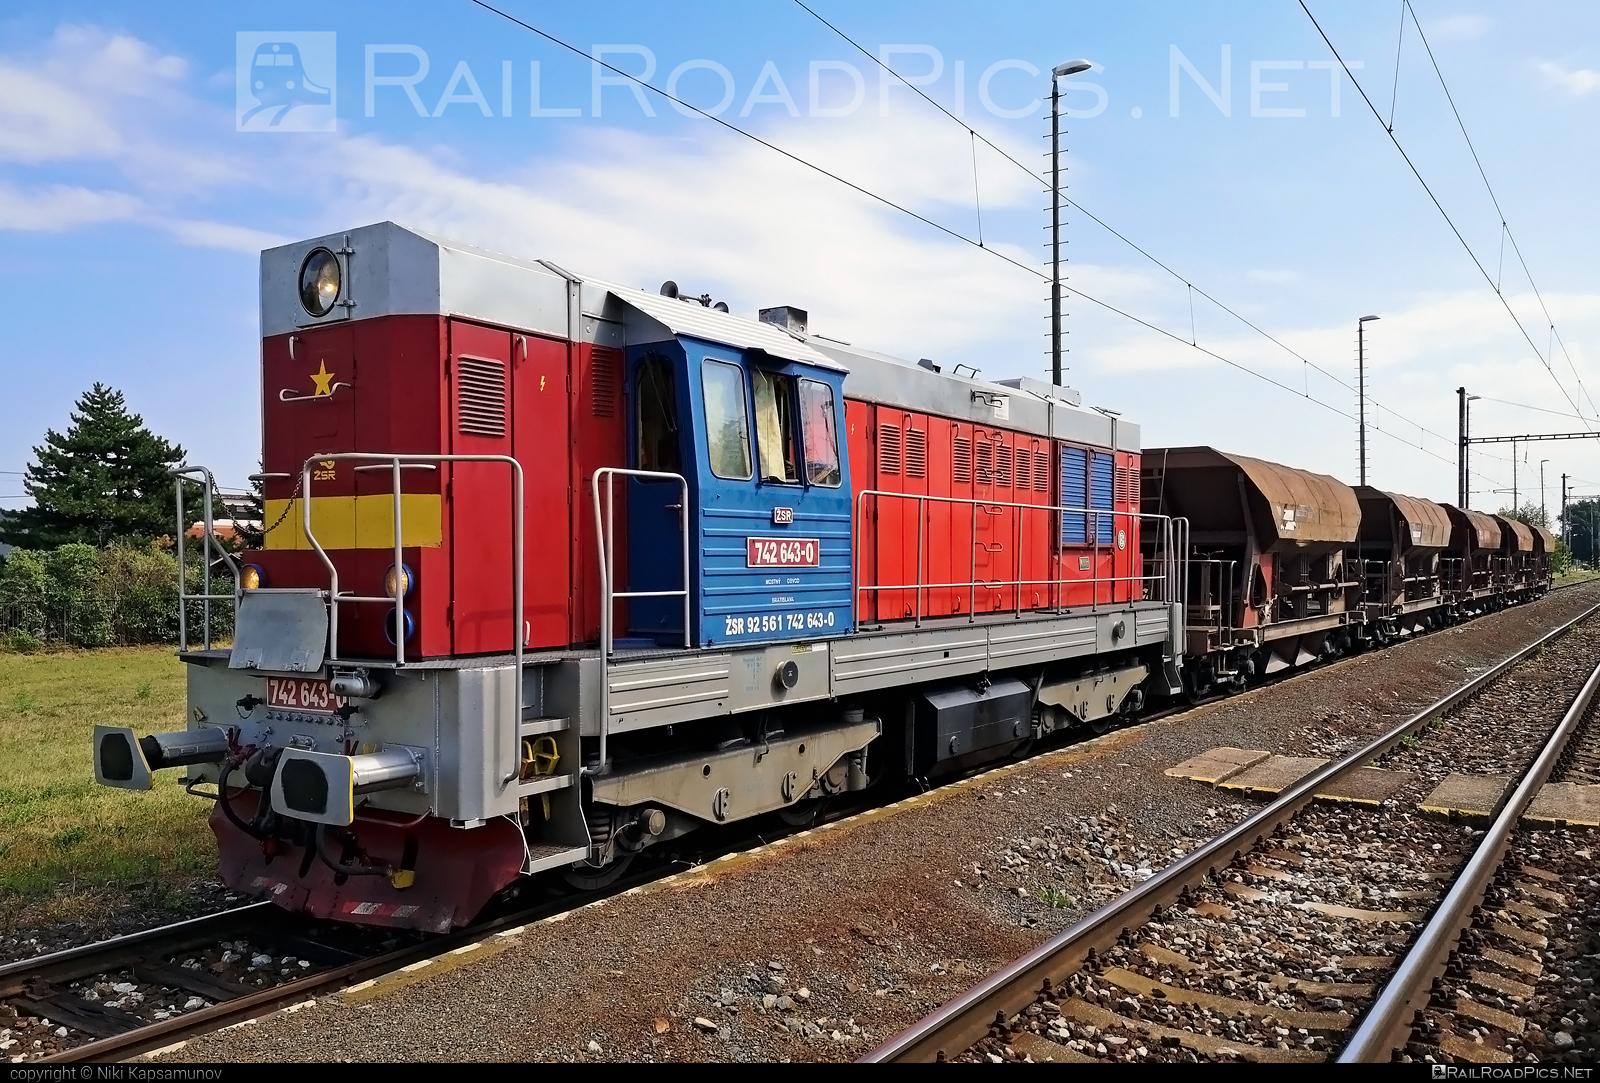 ČKD T 466.2 (742) - 742 643-0 operated by Železnice Slovenskej Republiky #ckd #ckd4662 #ckd742 #ckdt4662 #hopperwagon #zelezniceslovenskejrepubliky #zsr